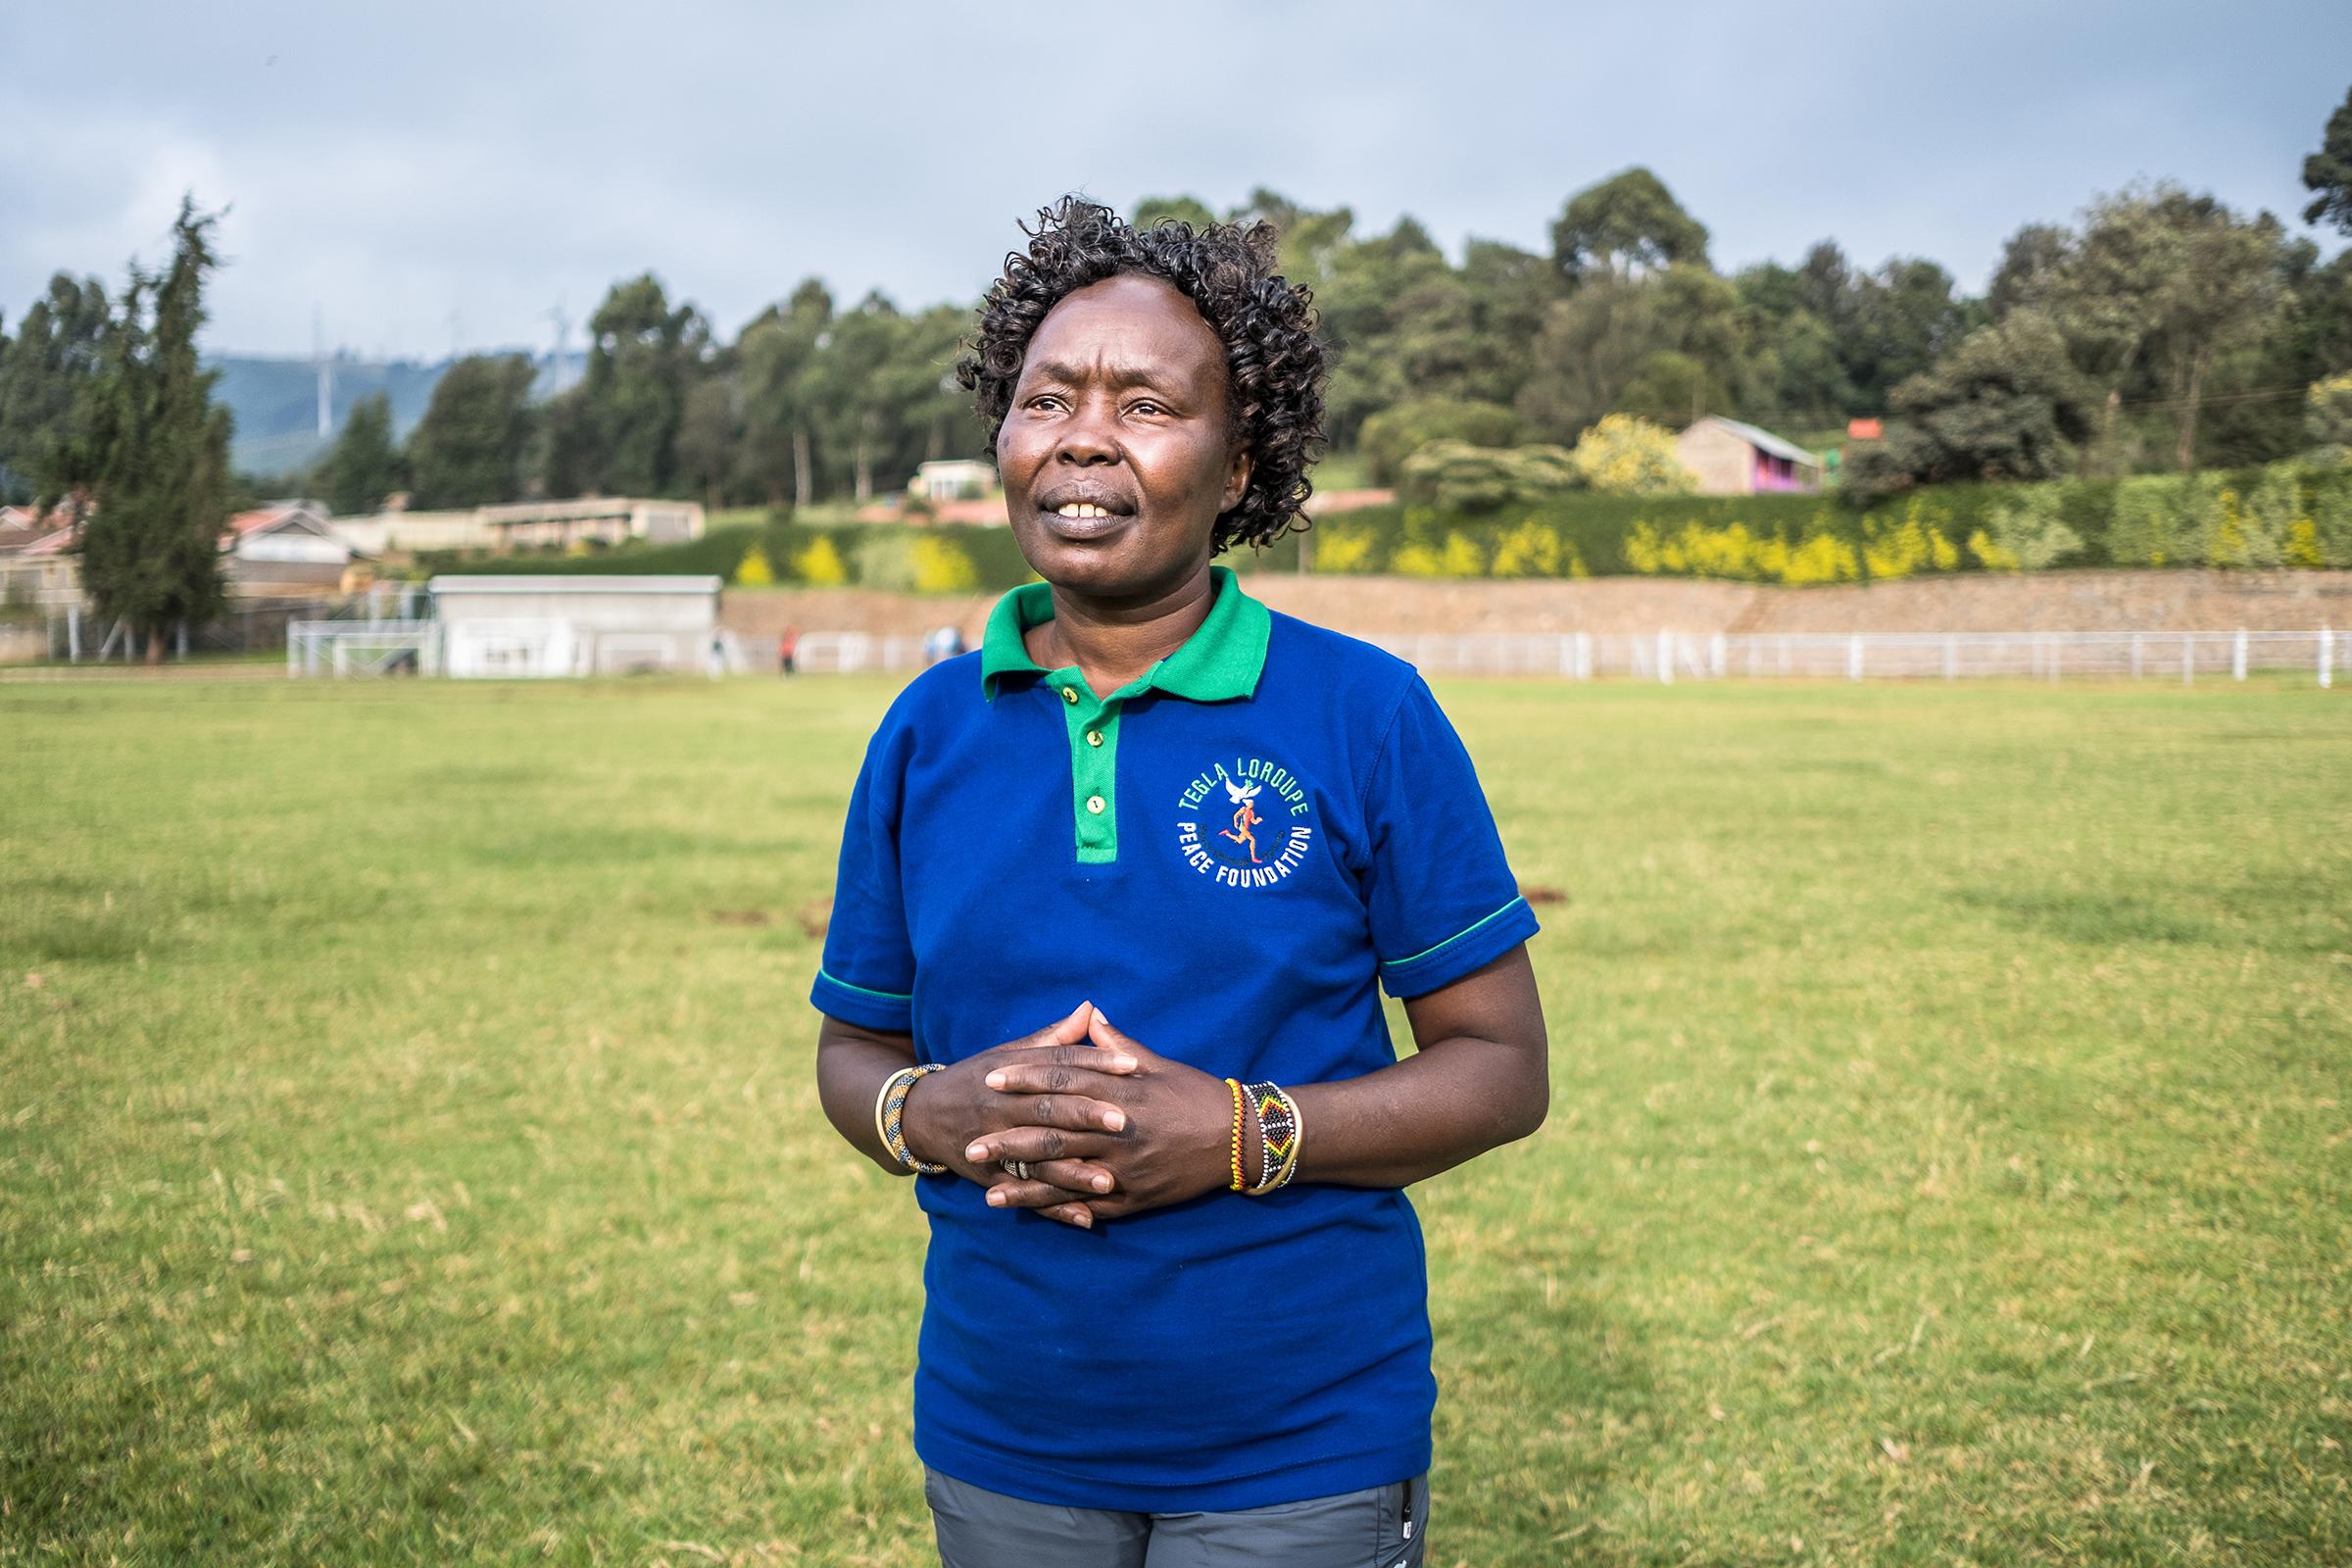 Camp founder Tegla Loroupe.